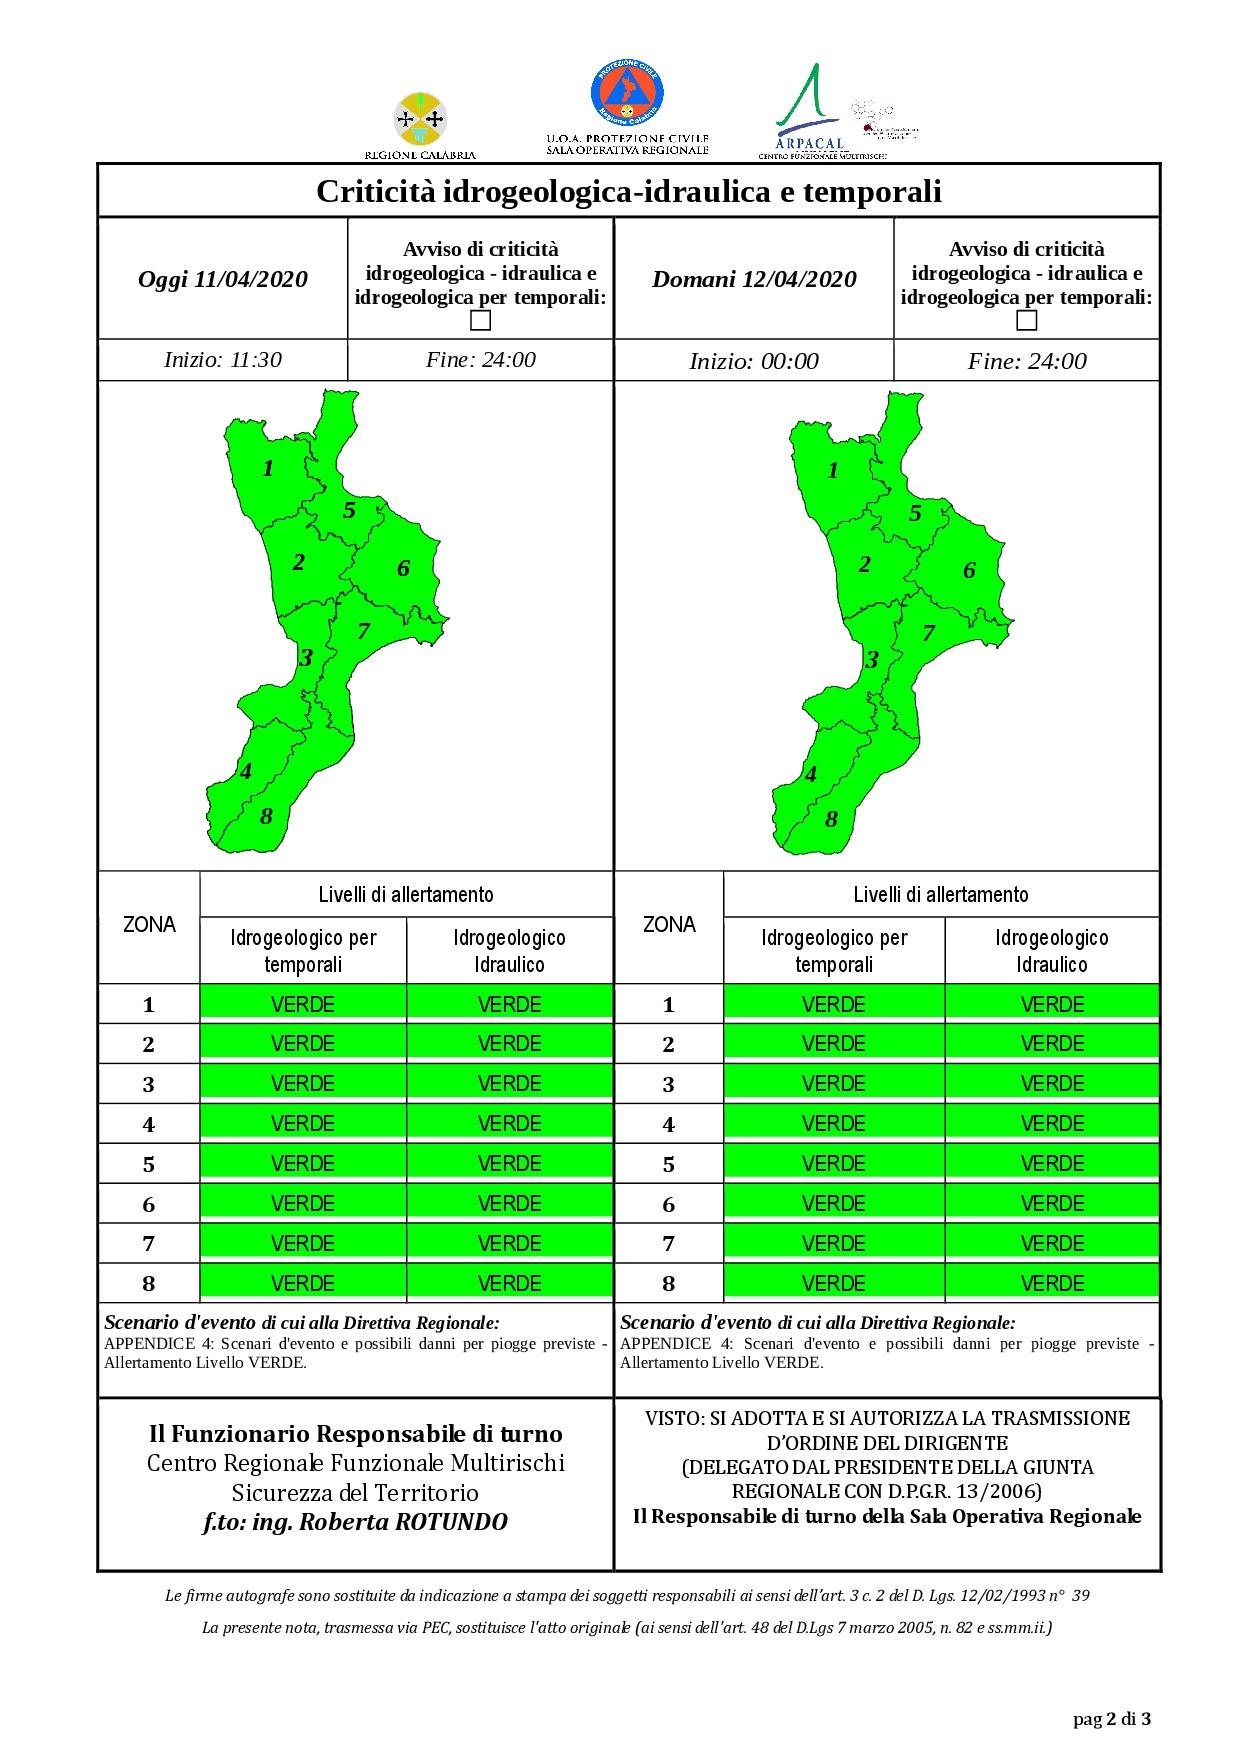 Criticità idrogeologica-idraulica e temporali in Calabria 11-04-2020